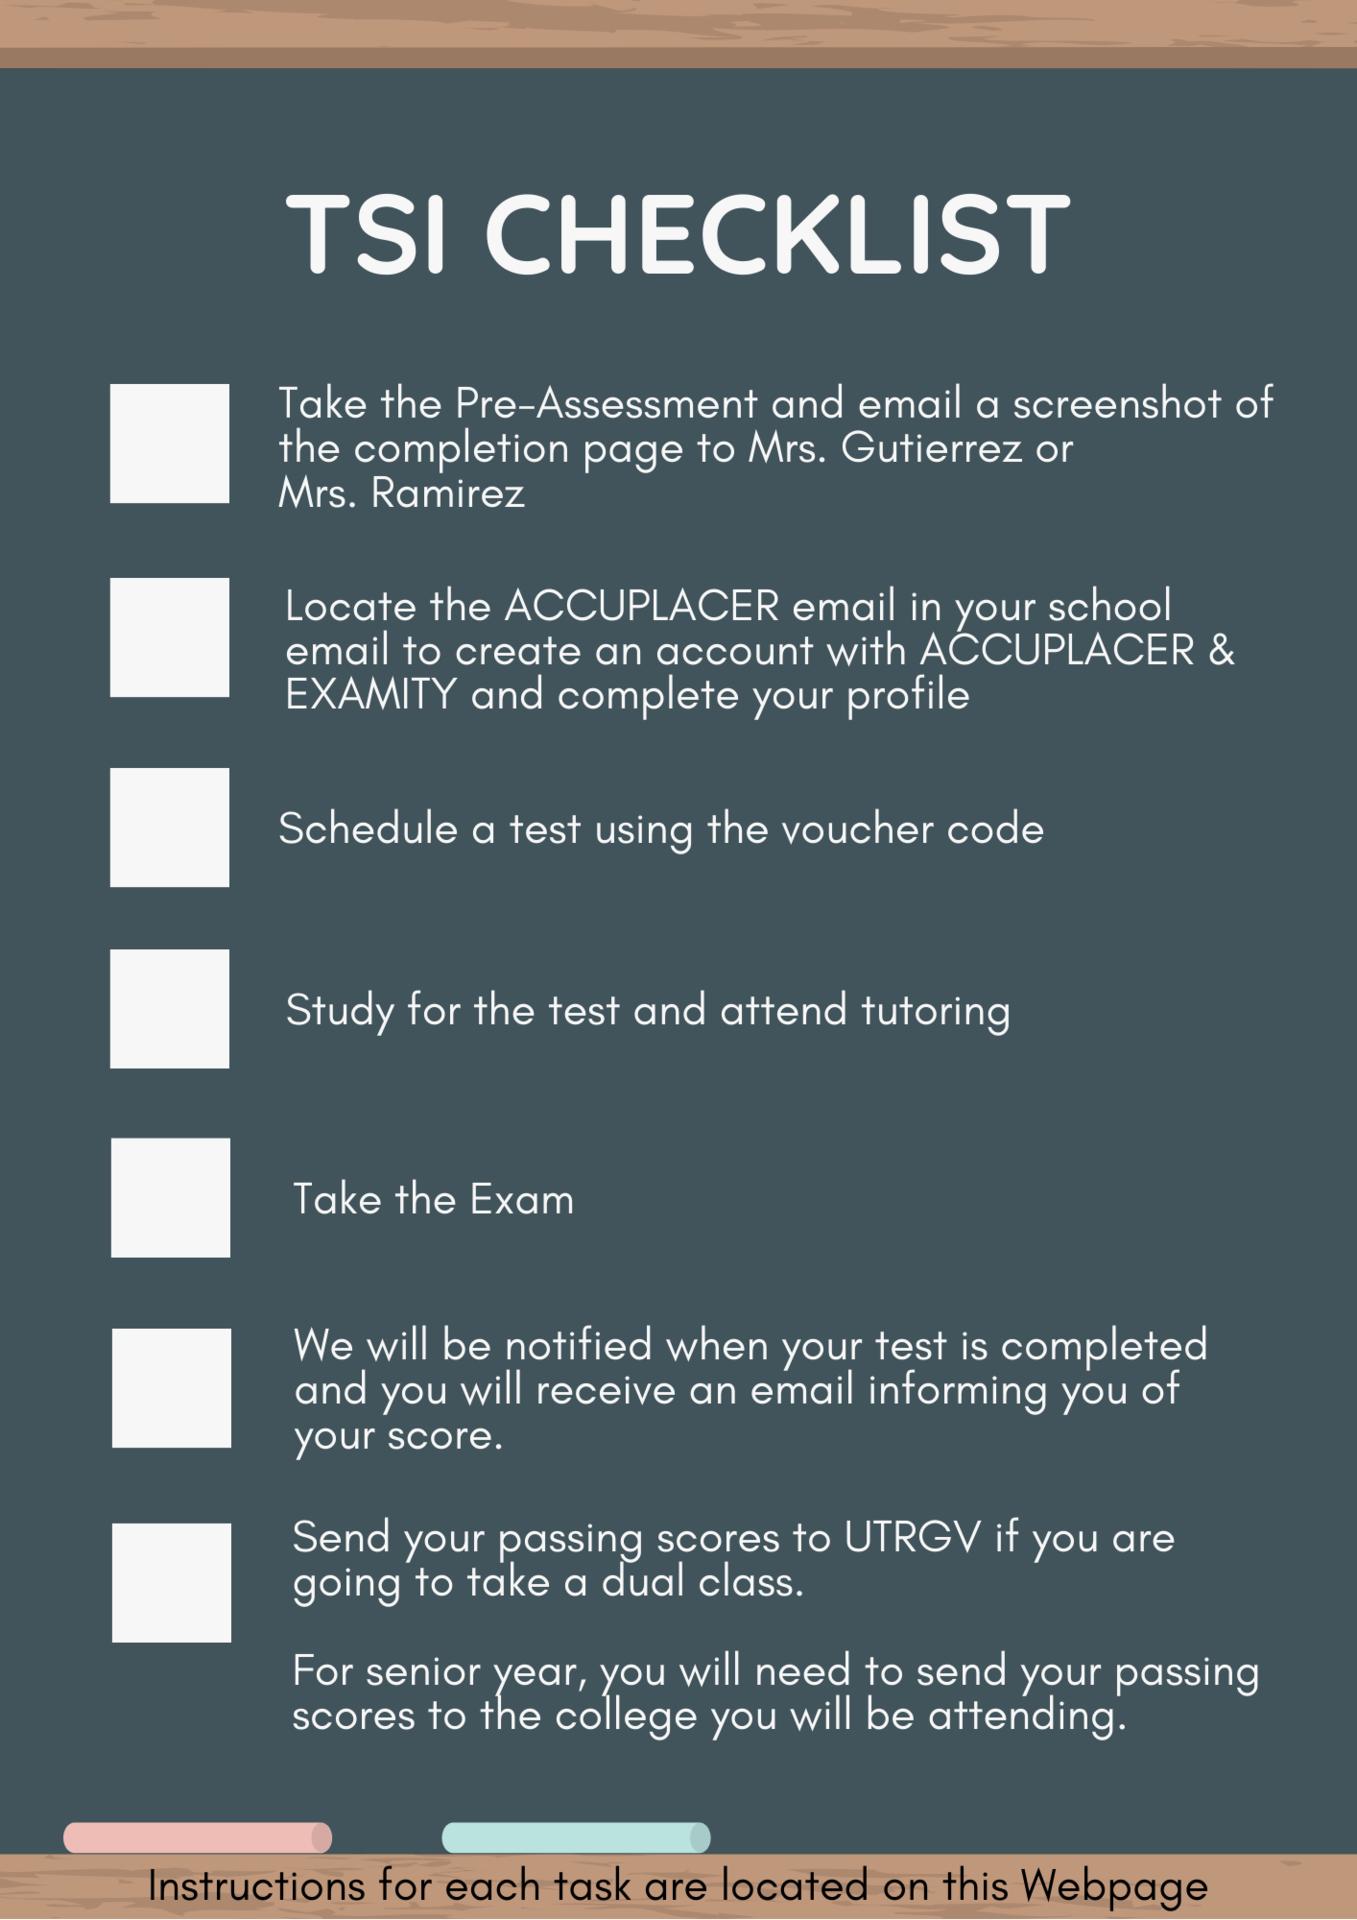 TSI Checklist